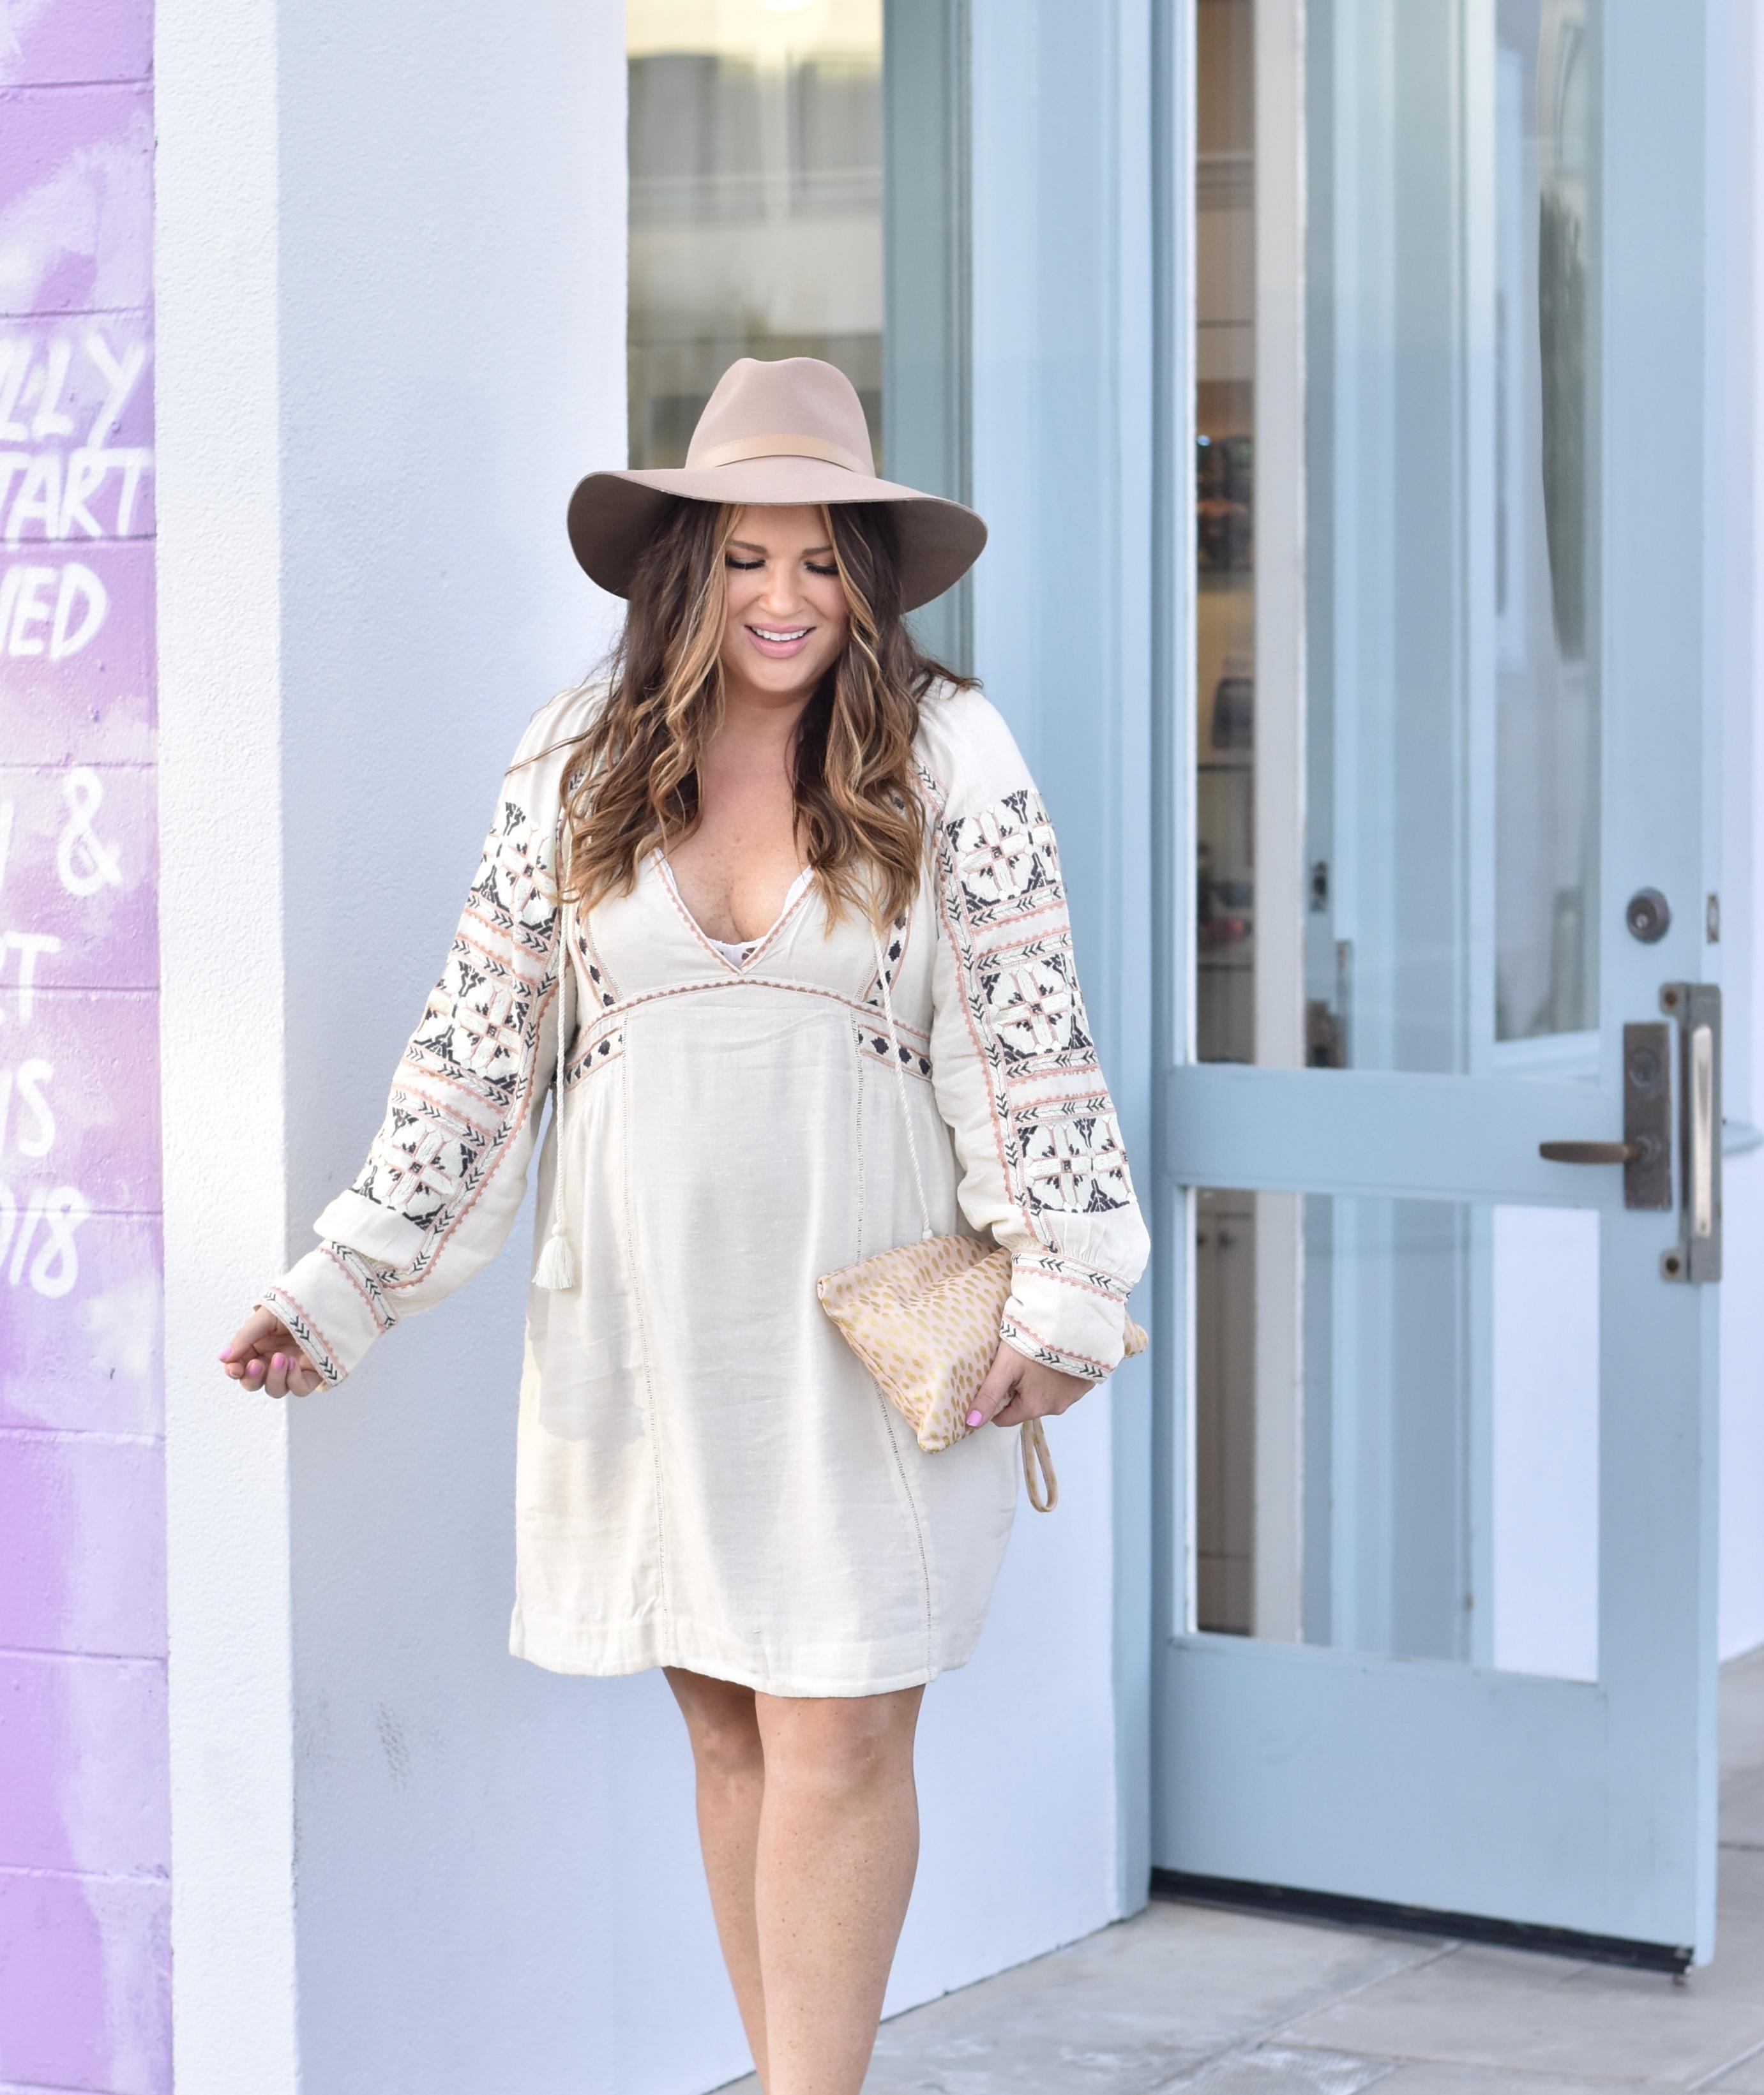 30A Blogger Weekend - Jami Ray wearing Free People dress in Seaside